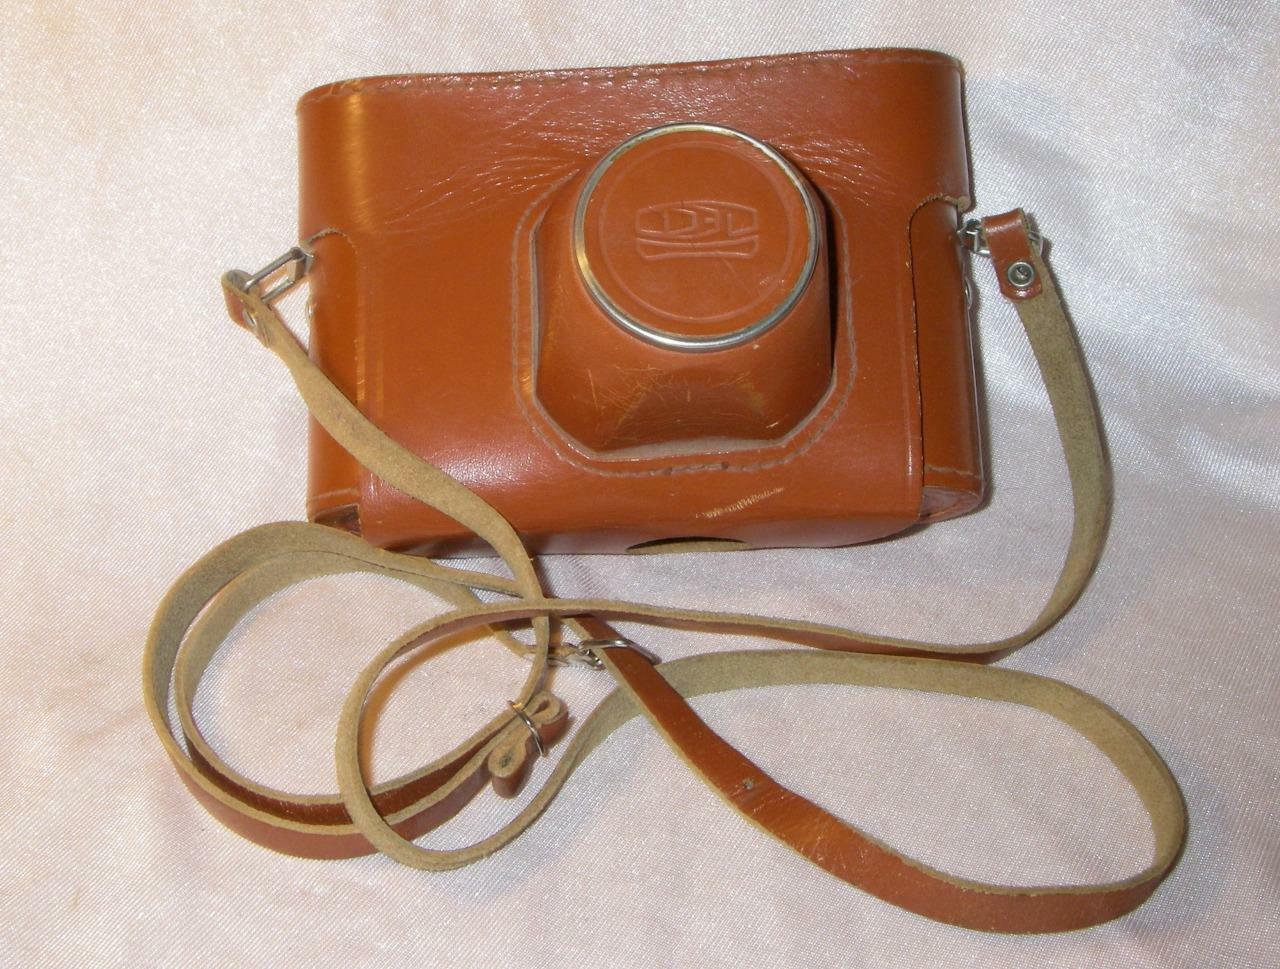 ORIGINAL LEATHER CASE for FED-5 FED-5V FED-5S camera w Industar-61L/D lens FED-3